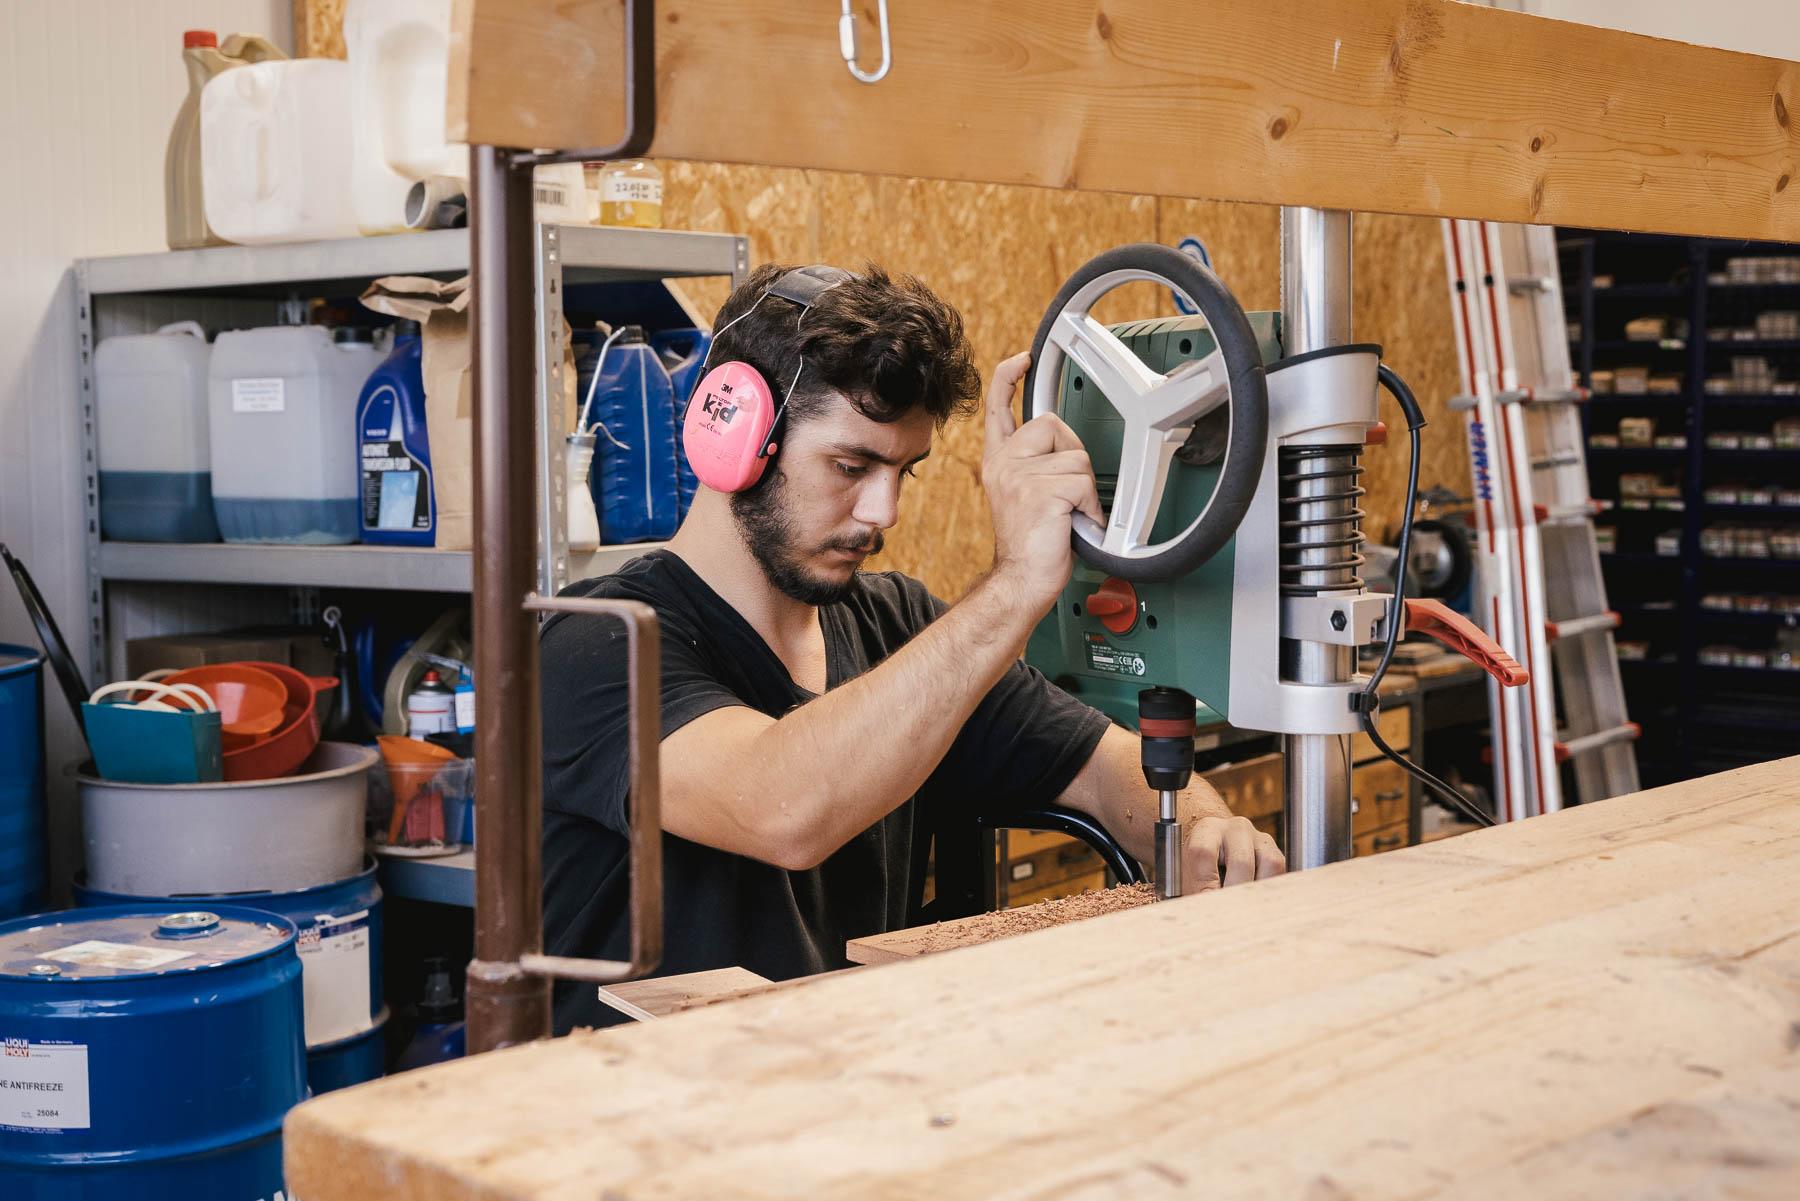 Ausbildung-Bootsbau-Ausbildungsbetrieb-Norman-Bootsbau-Potsdam